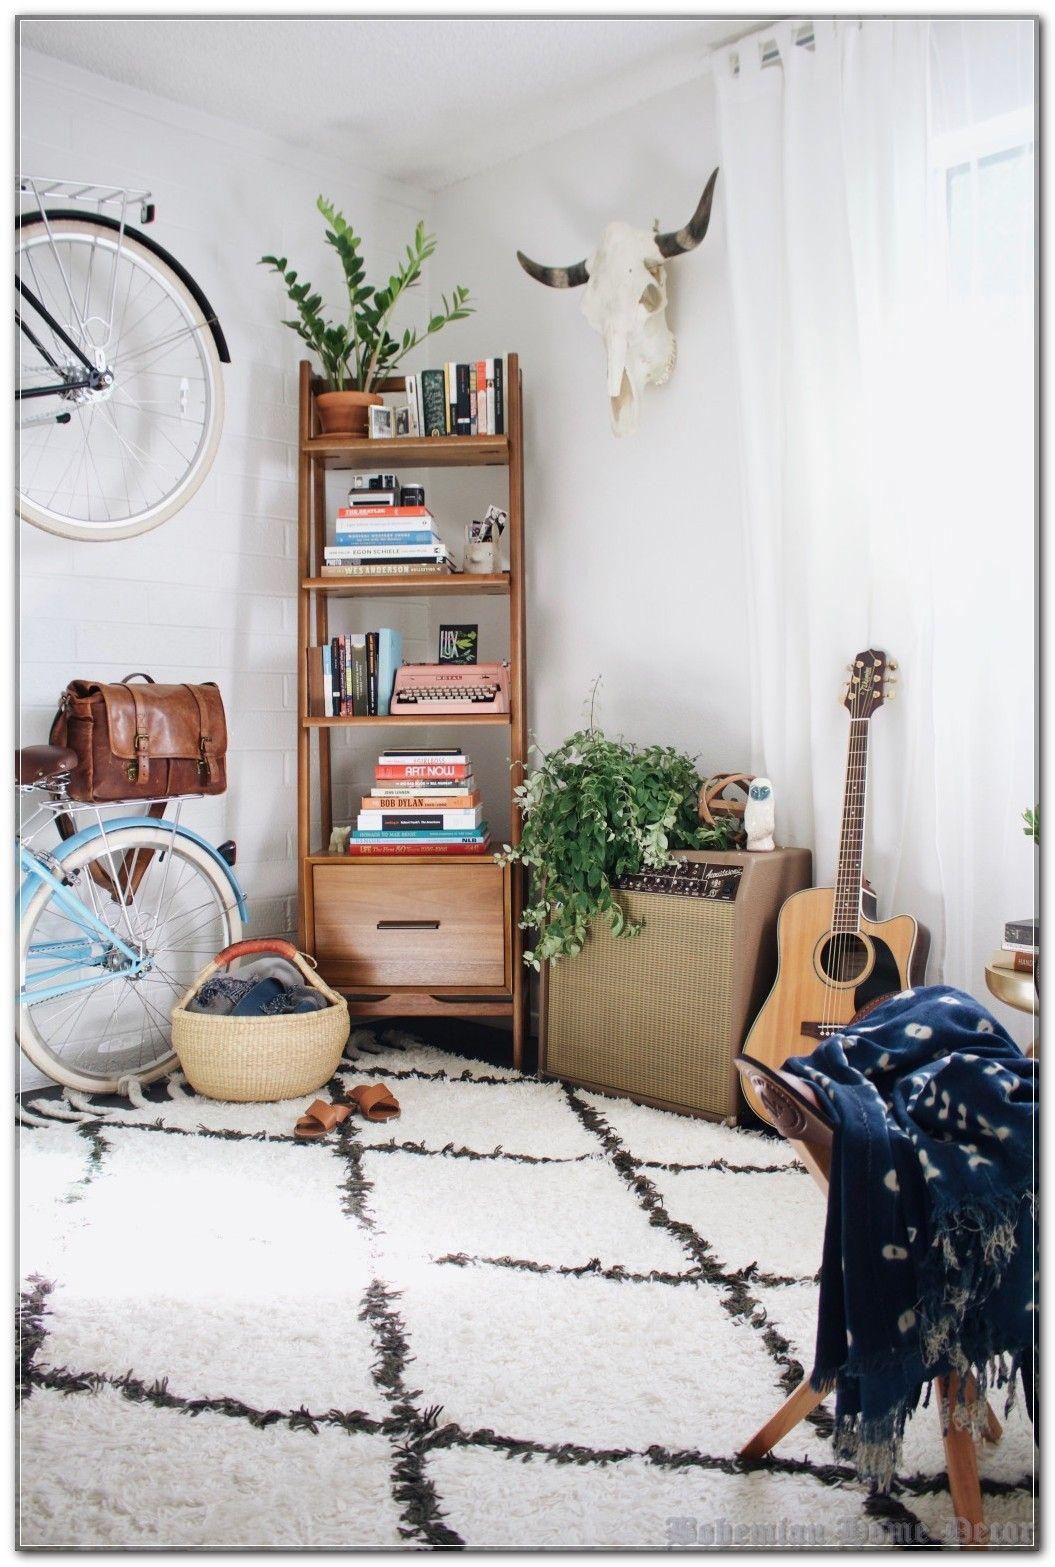 Take Advantage Of Bohemian Home Decor – Read These 10 Tips